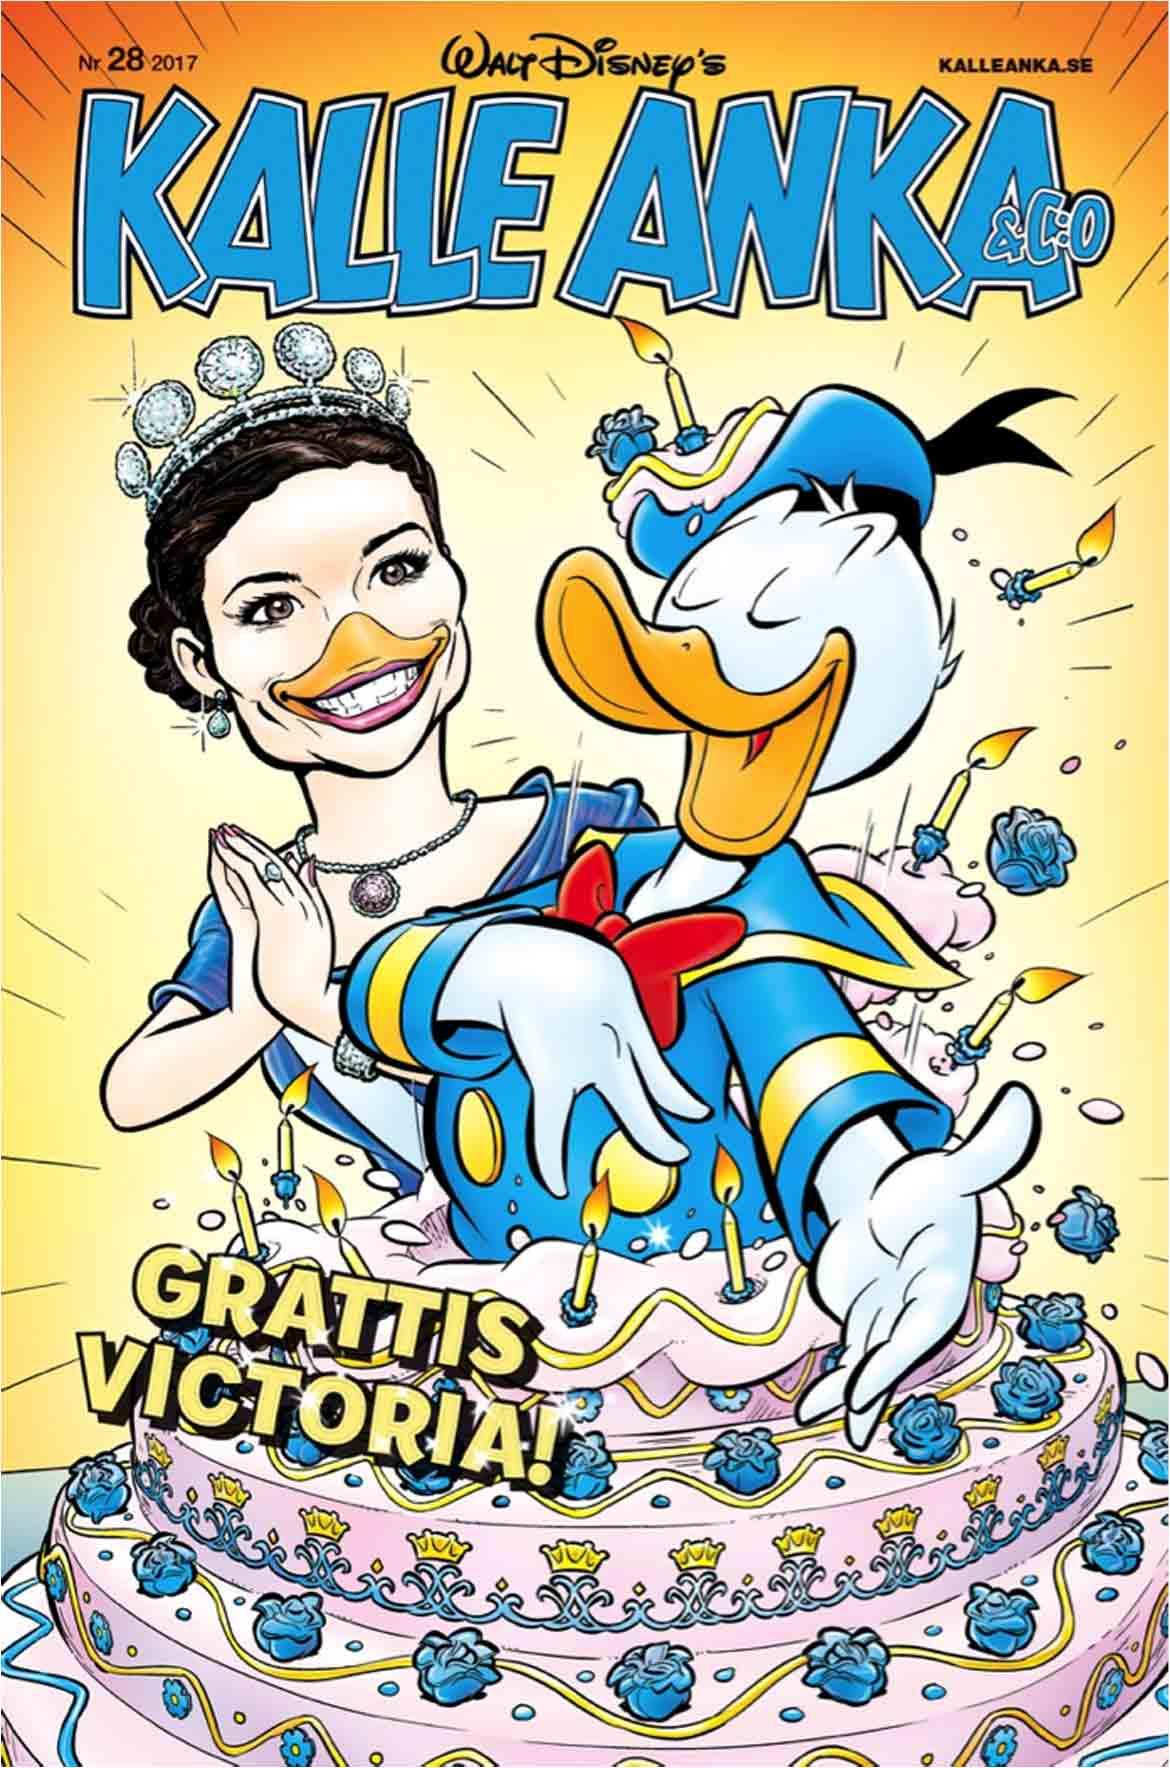 Kronprinsessan Victoria ankifierad